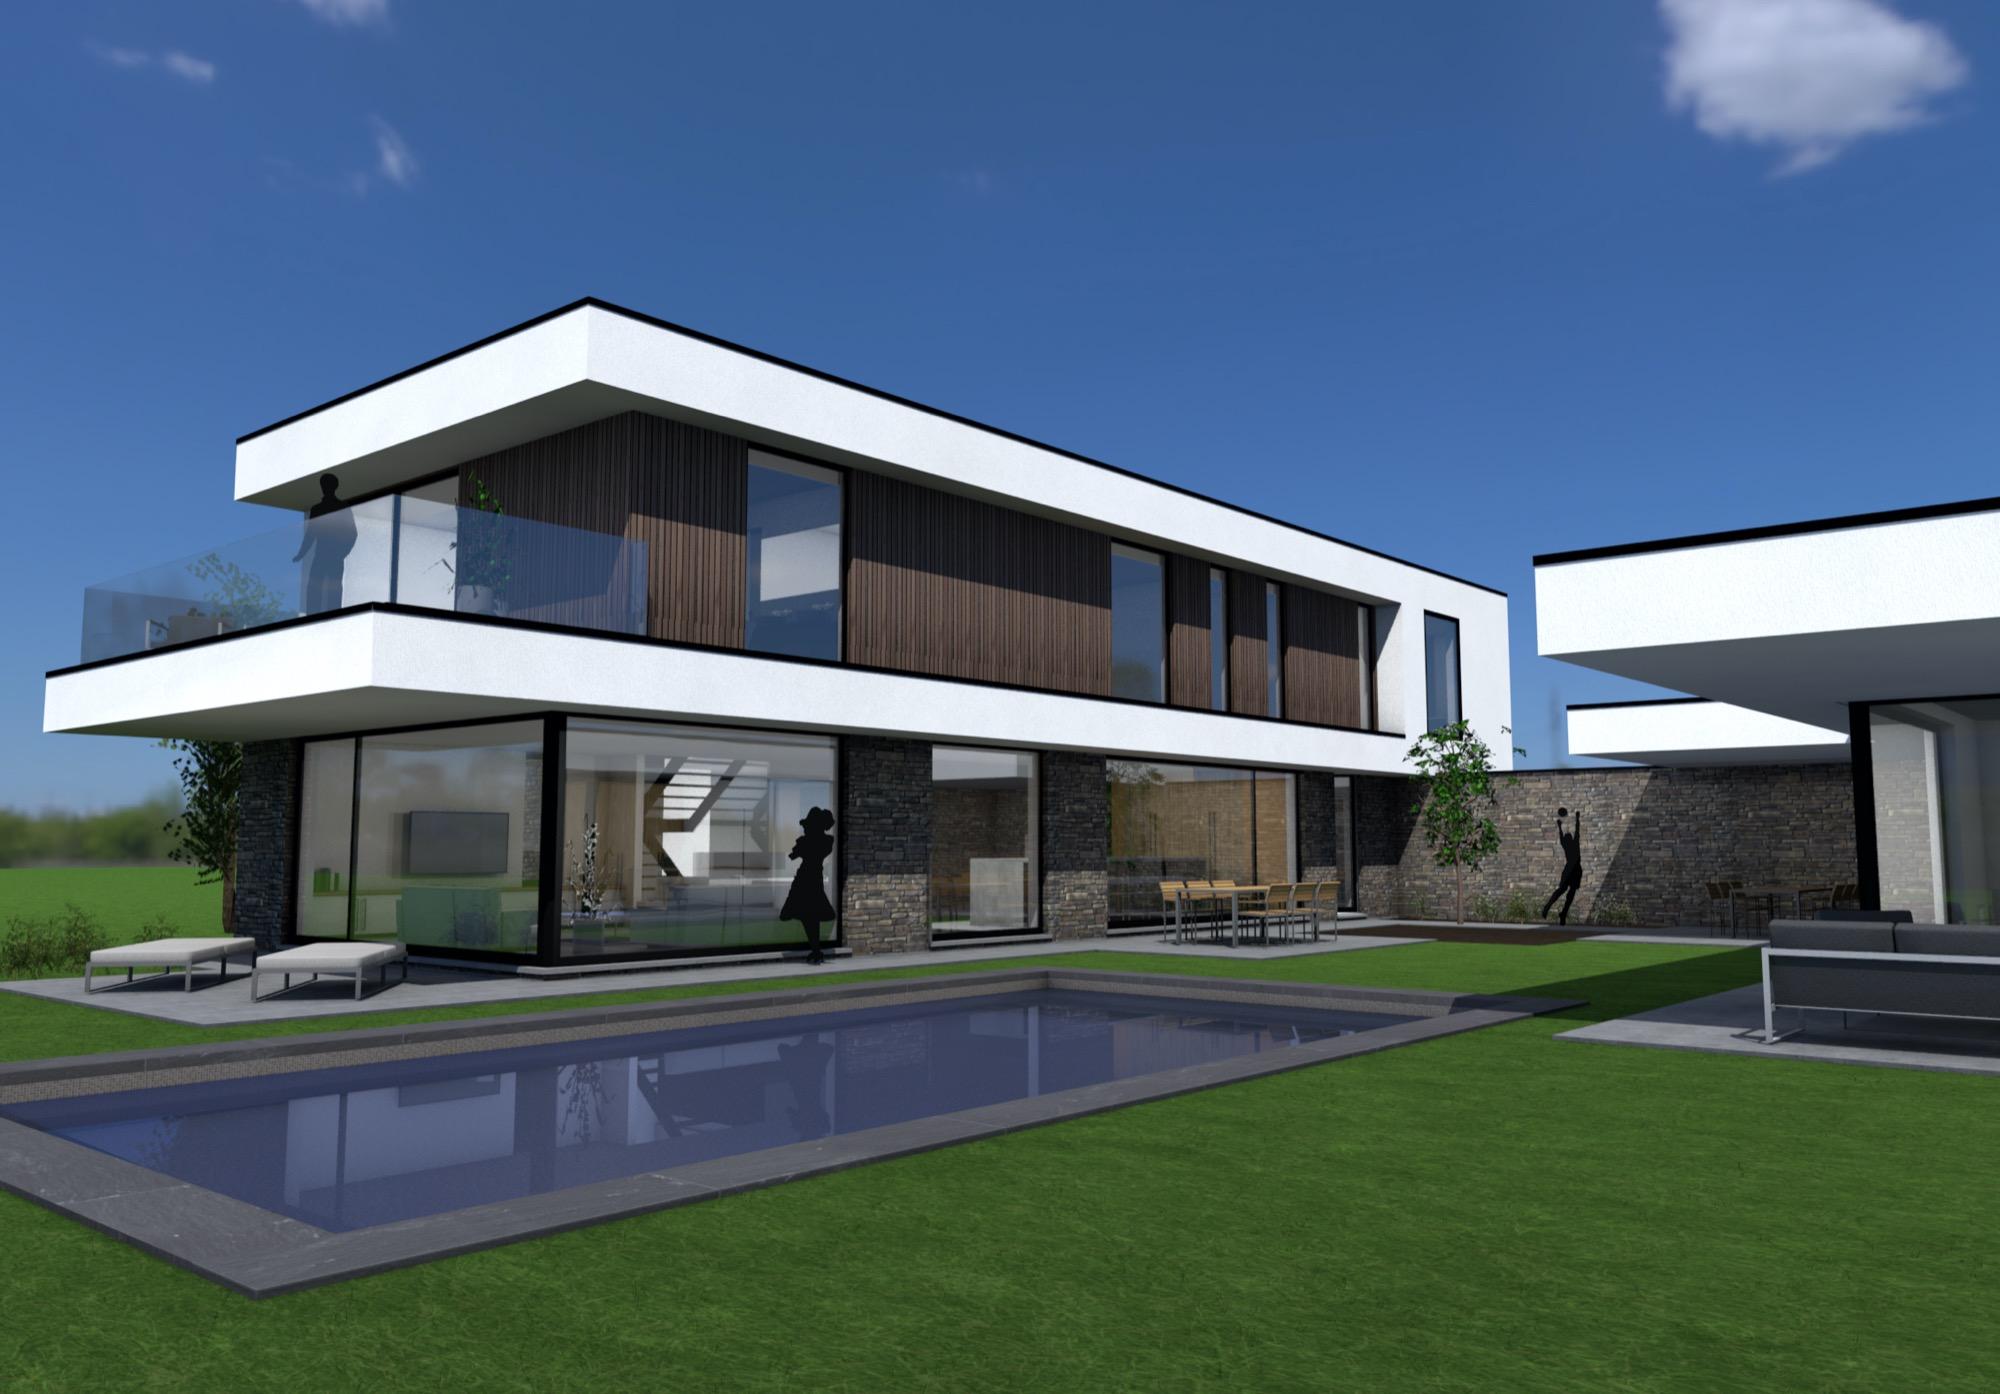 Render achterkant moderne woning met terras en zwembad